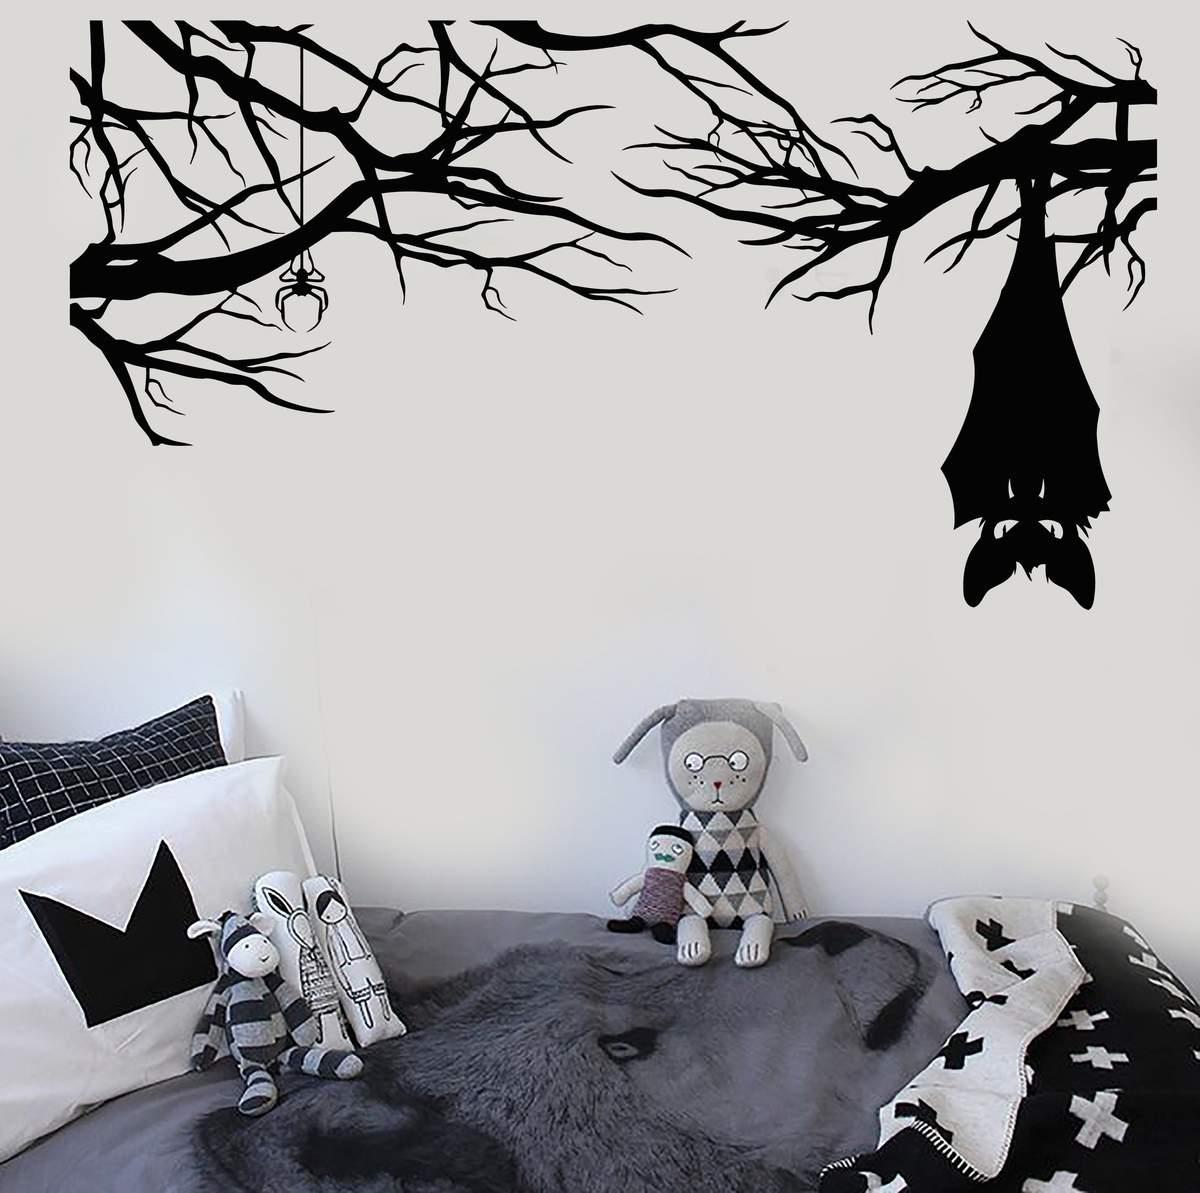 spooky Halloween decorations black bat wall stickers in a kids room